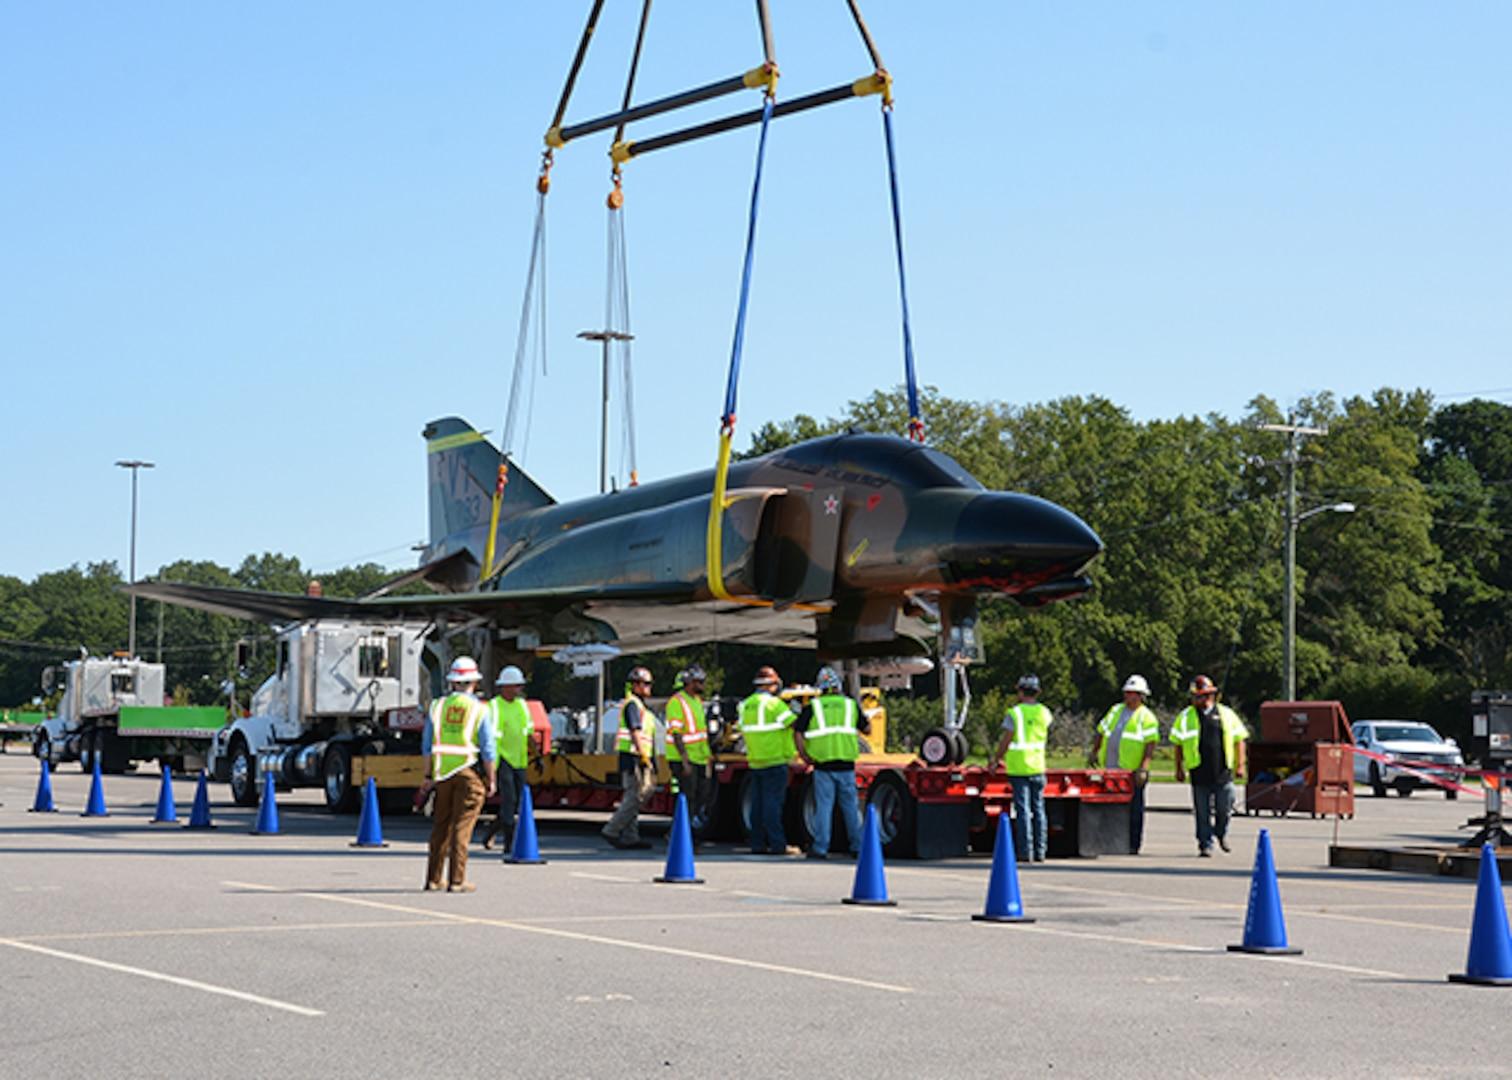 F-4 Phantom II is loaded on a transport